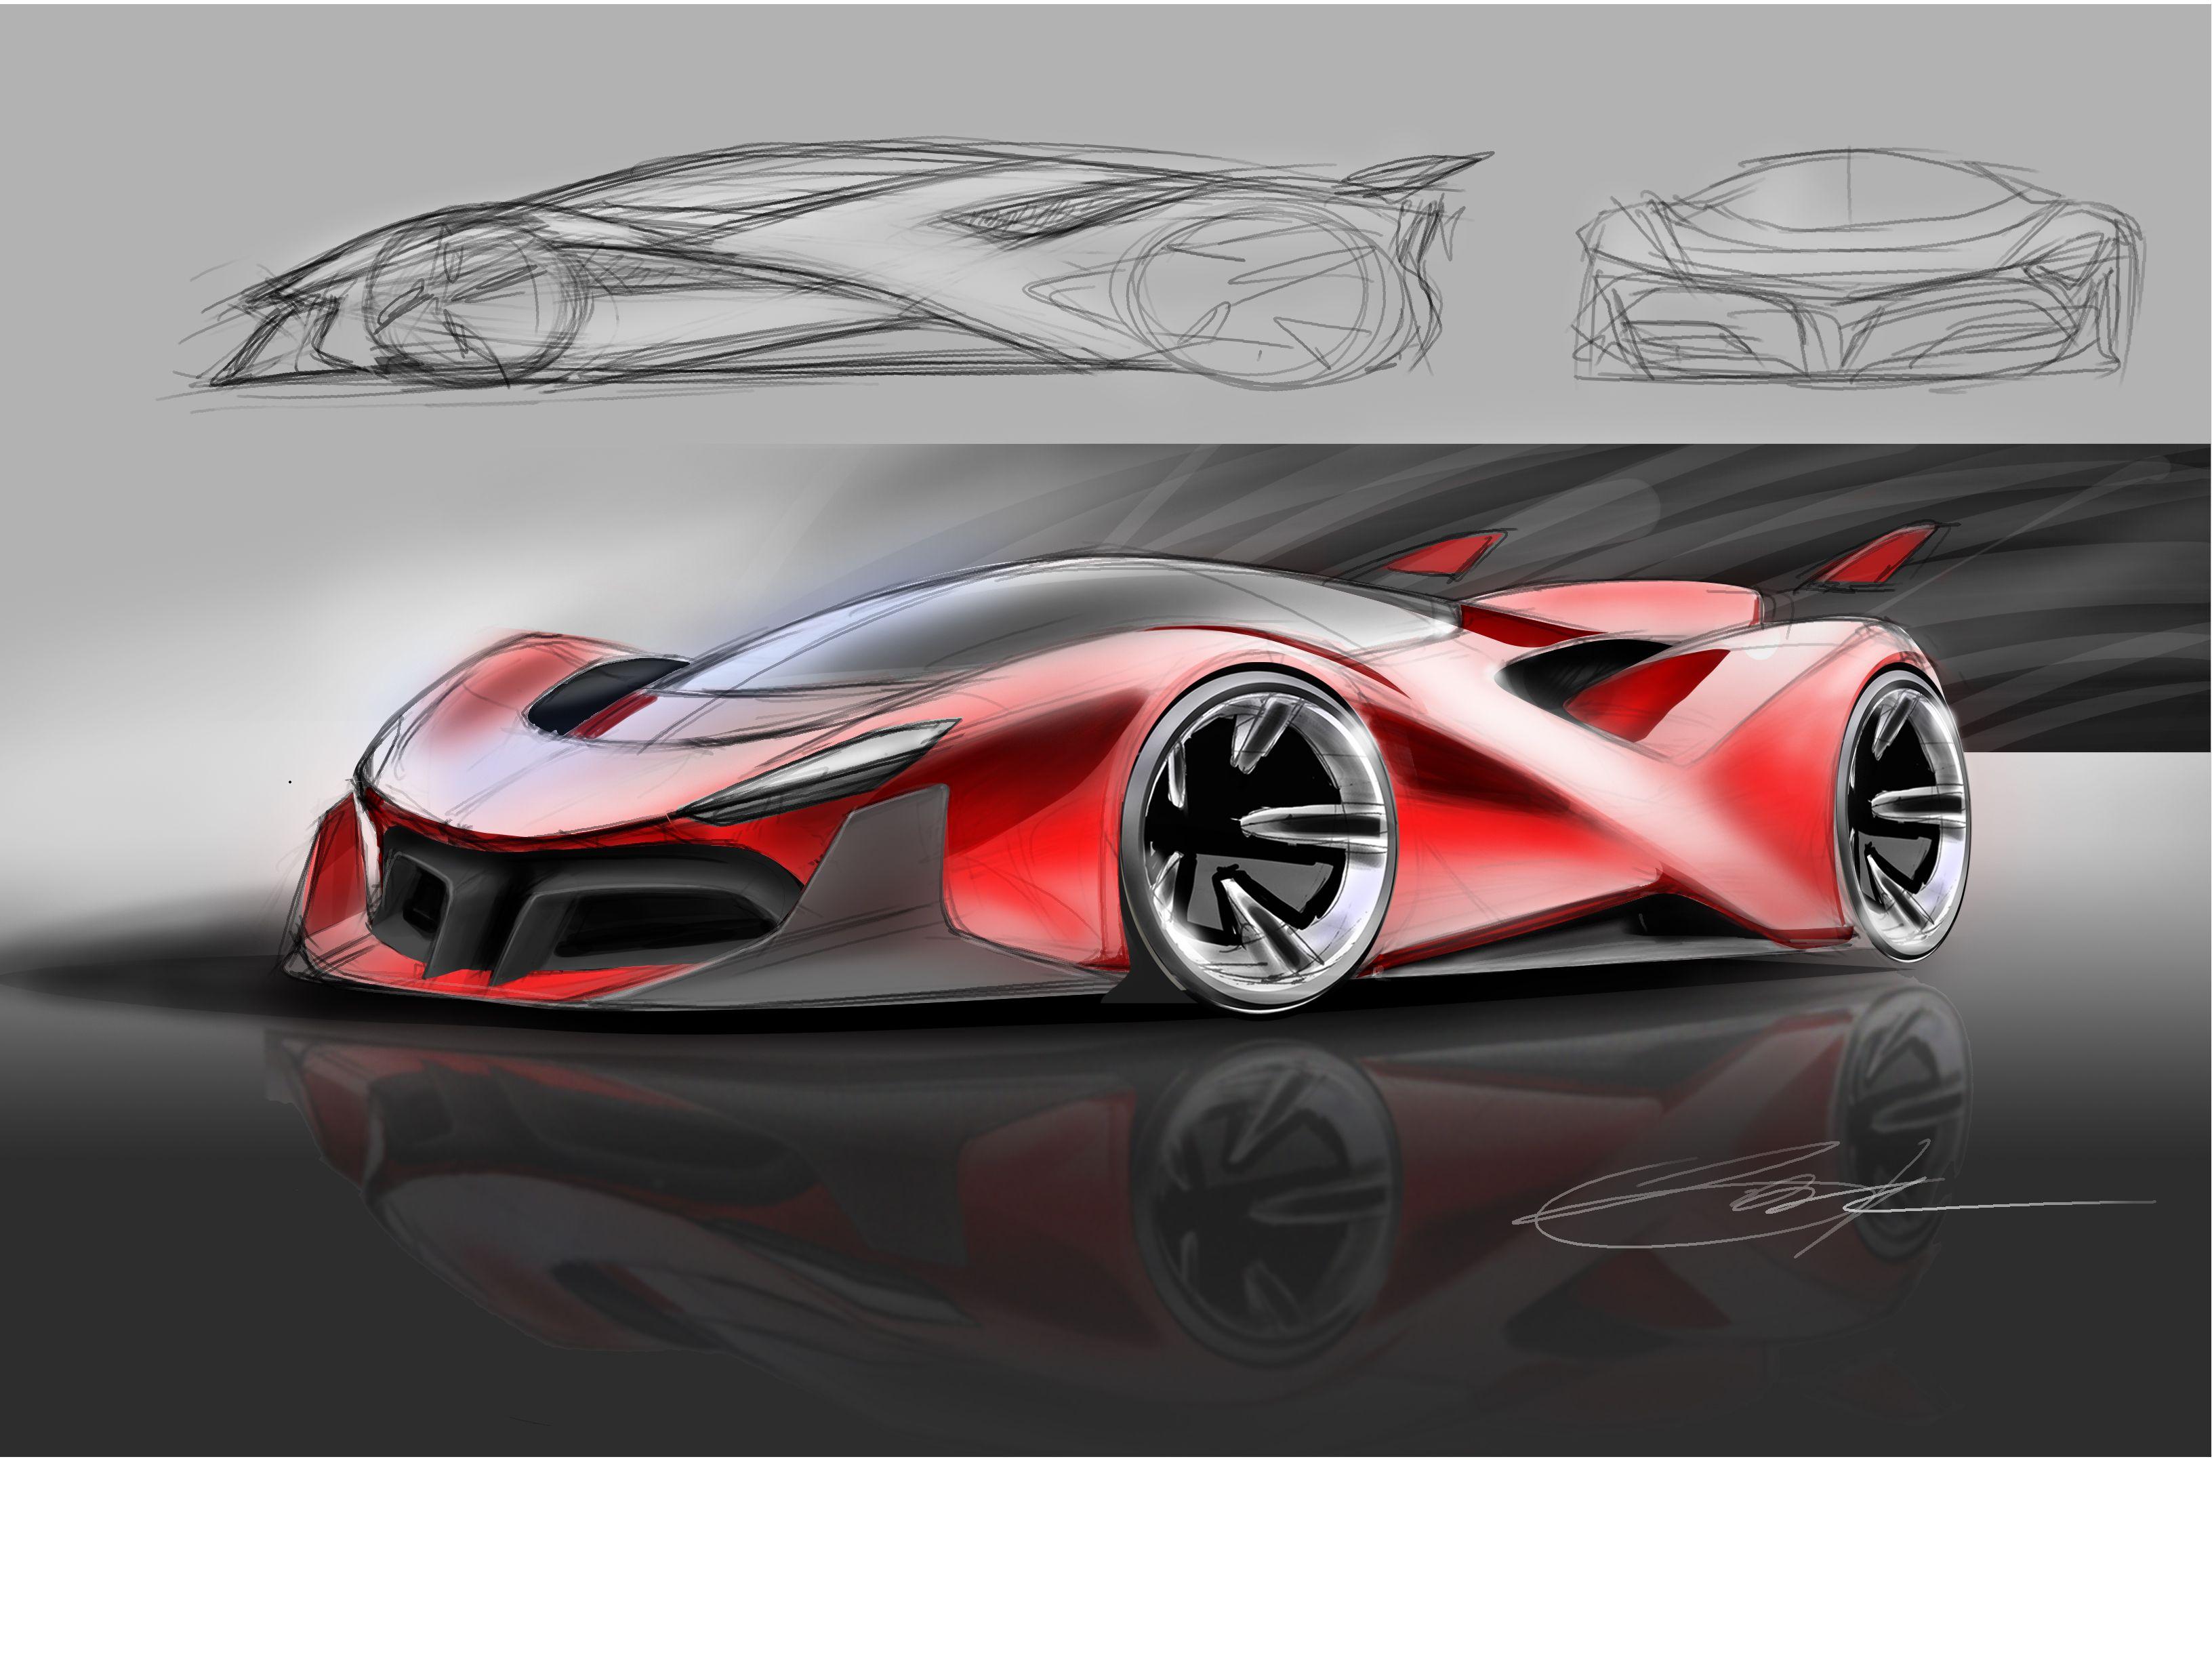 Ferrari Concept Car Design Concept Cars Trike